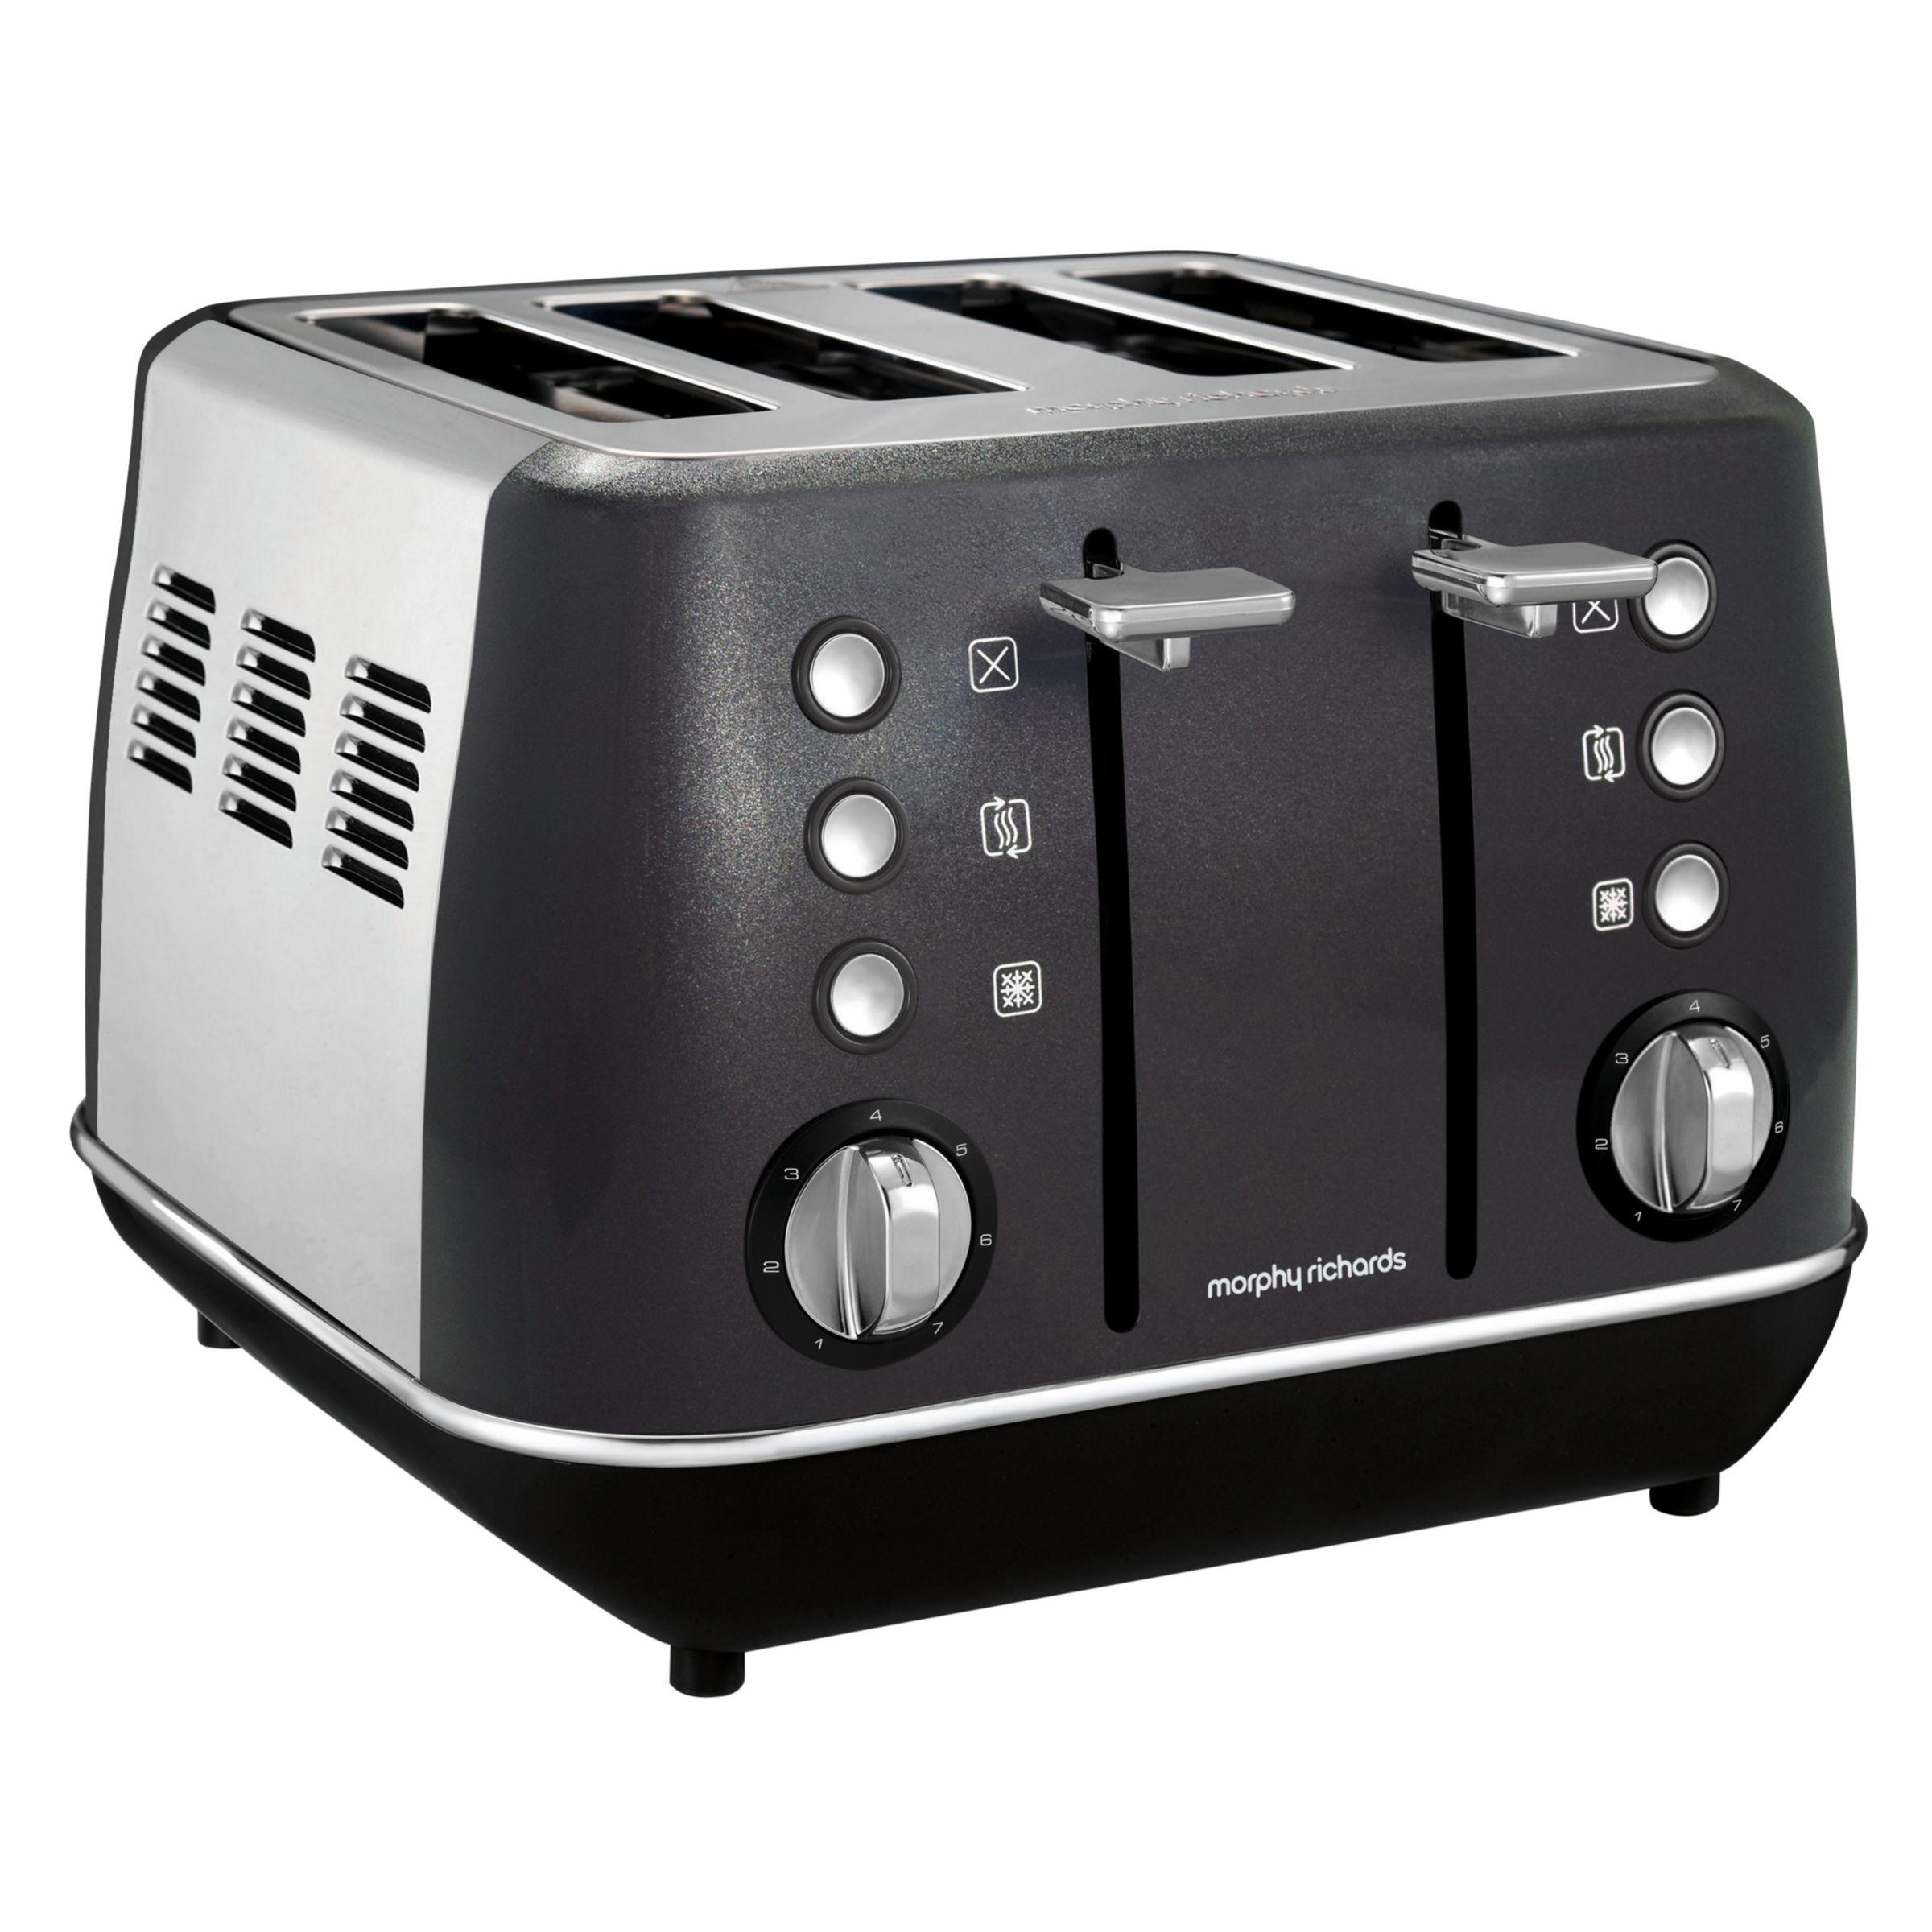 action black show toaster slice details shop product beko victory